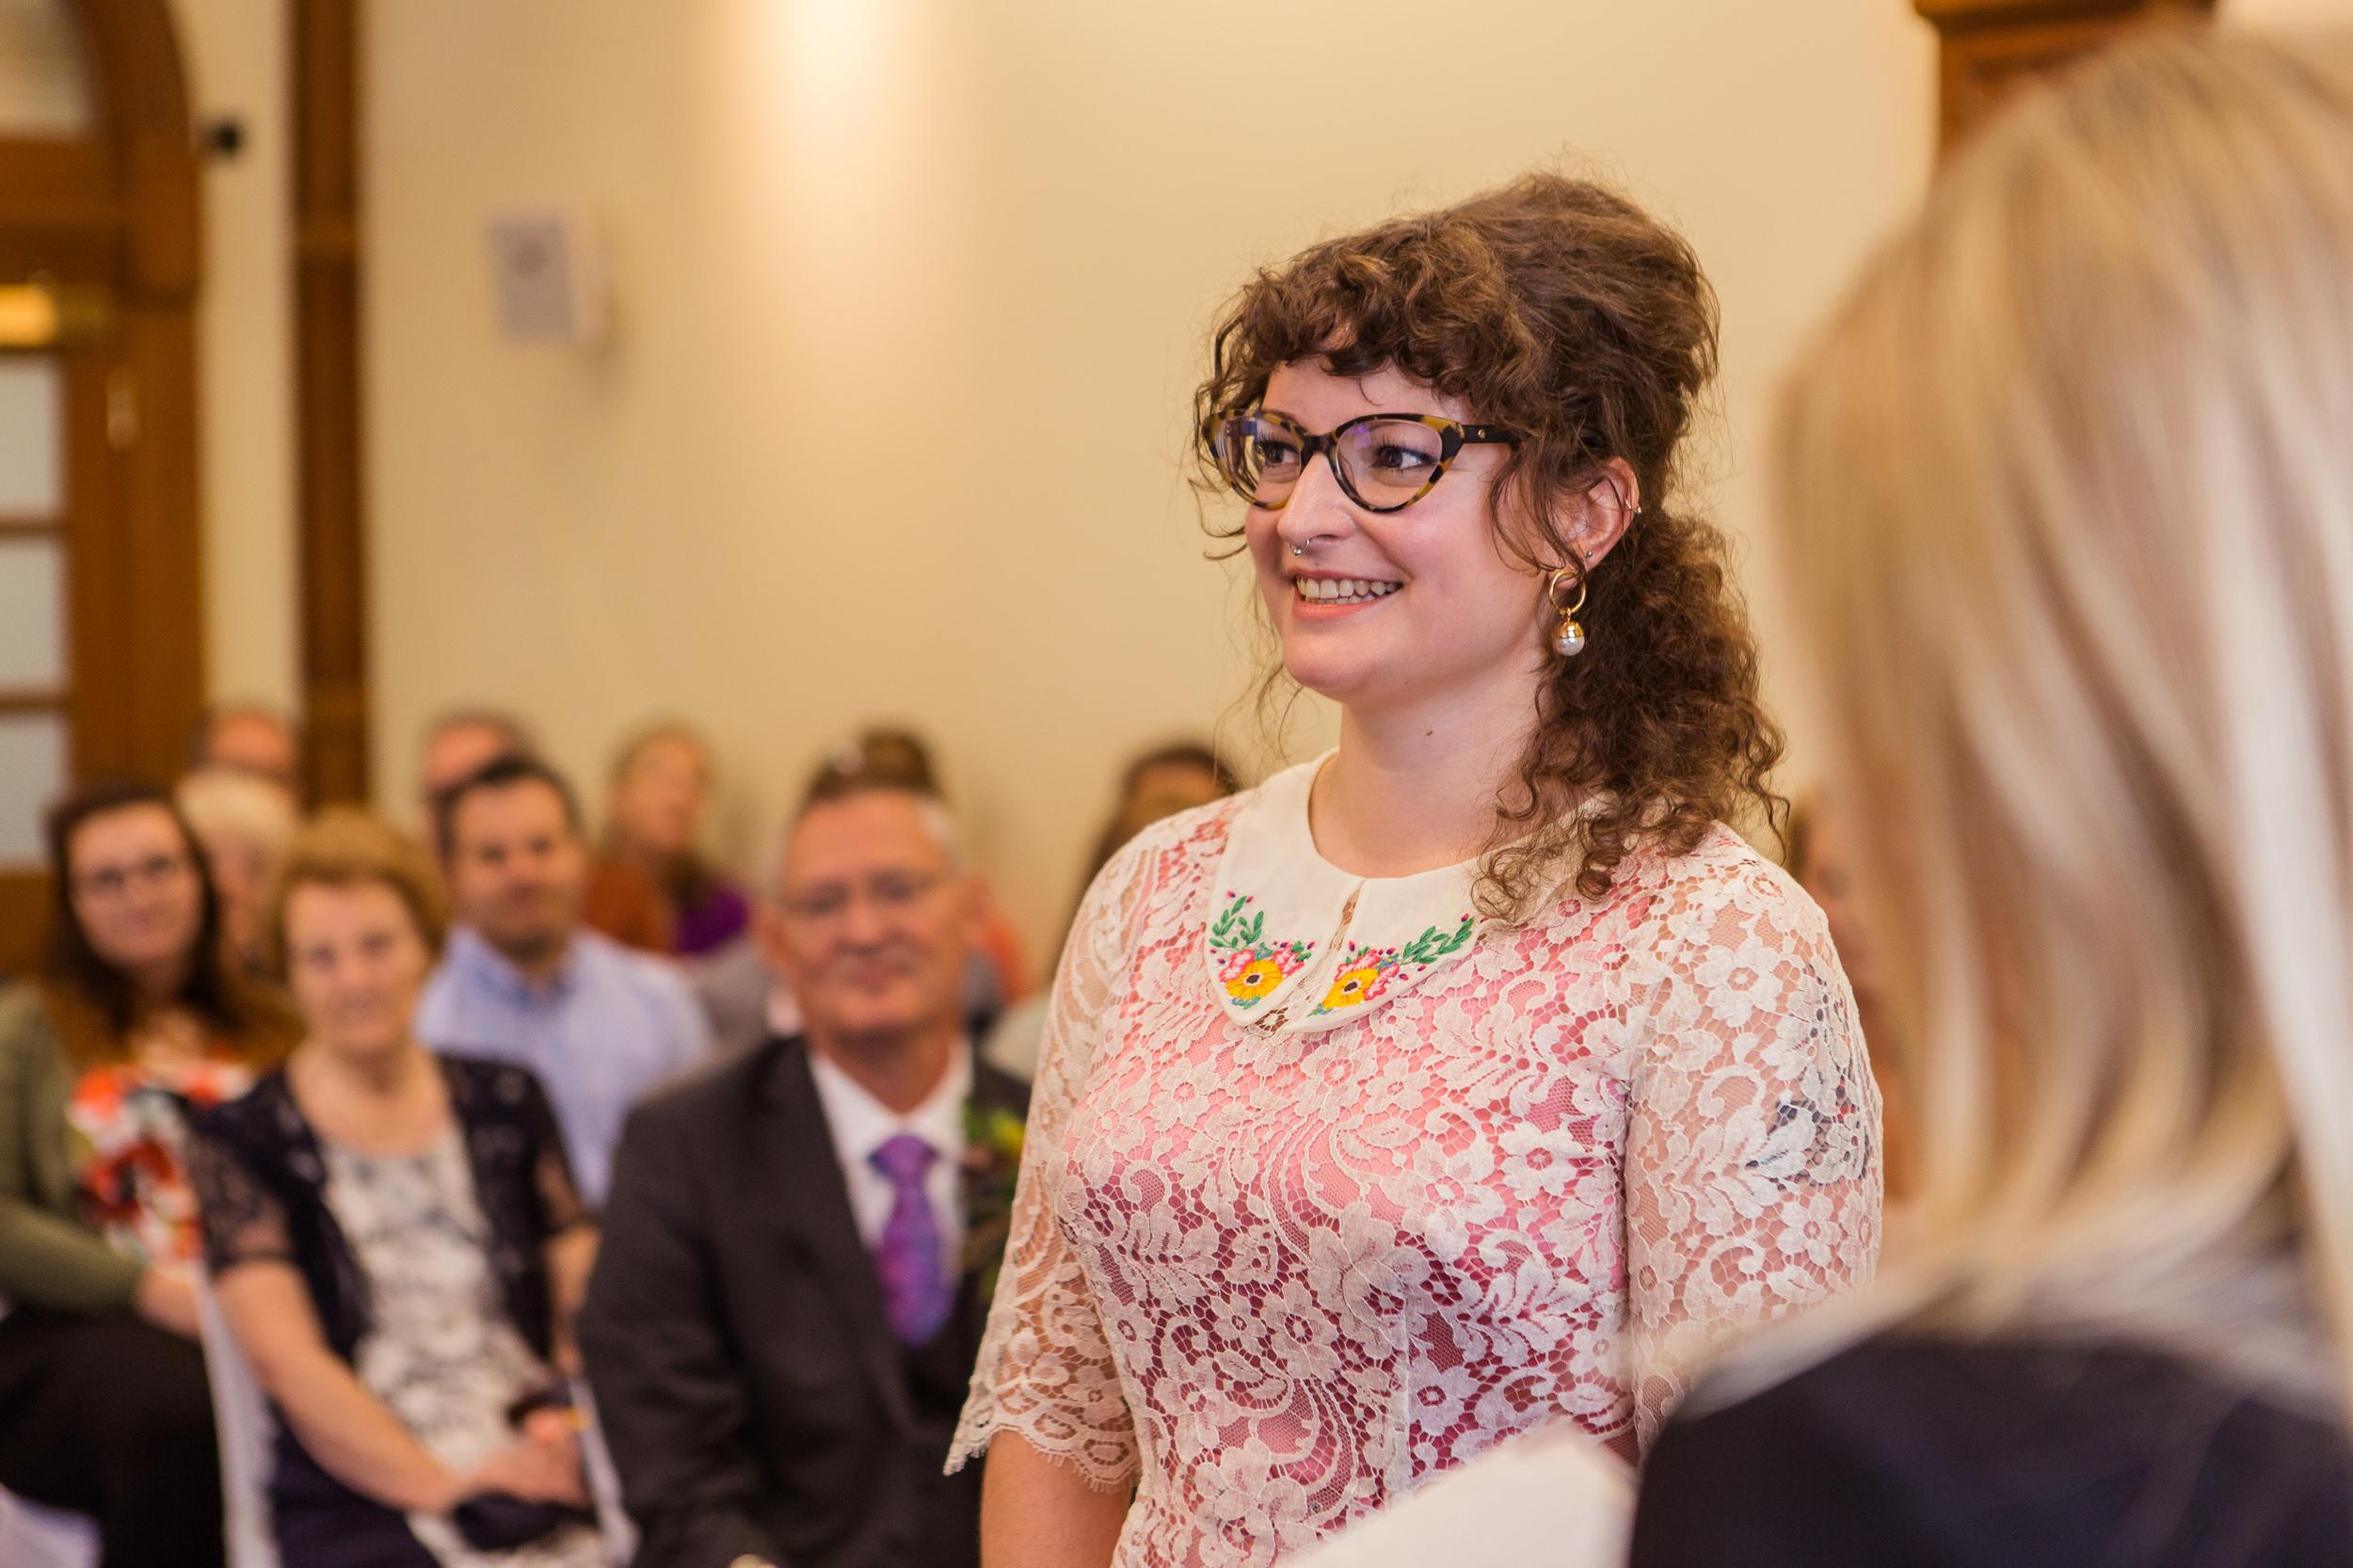 Emma-Coloured-Wedding-Dress-Sheffield-Kate-Beaumont-6.jpg